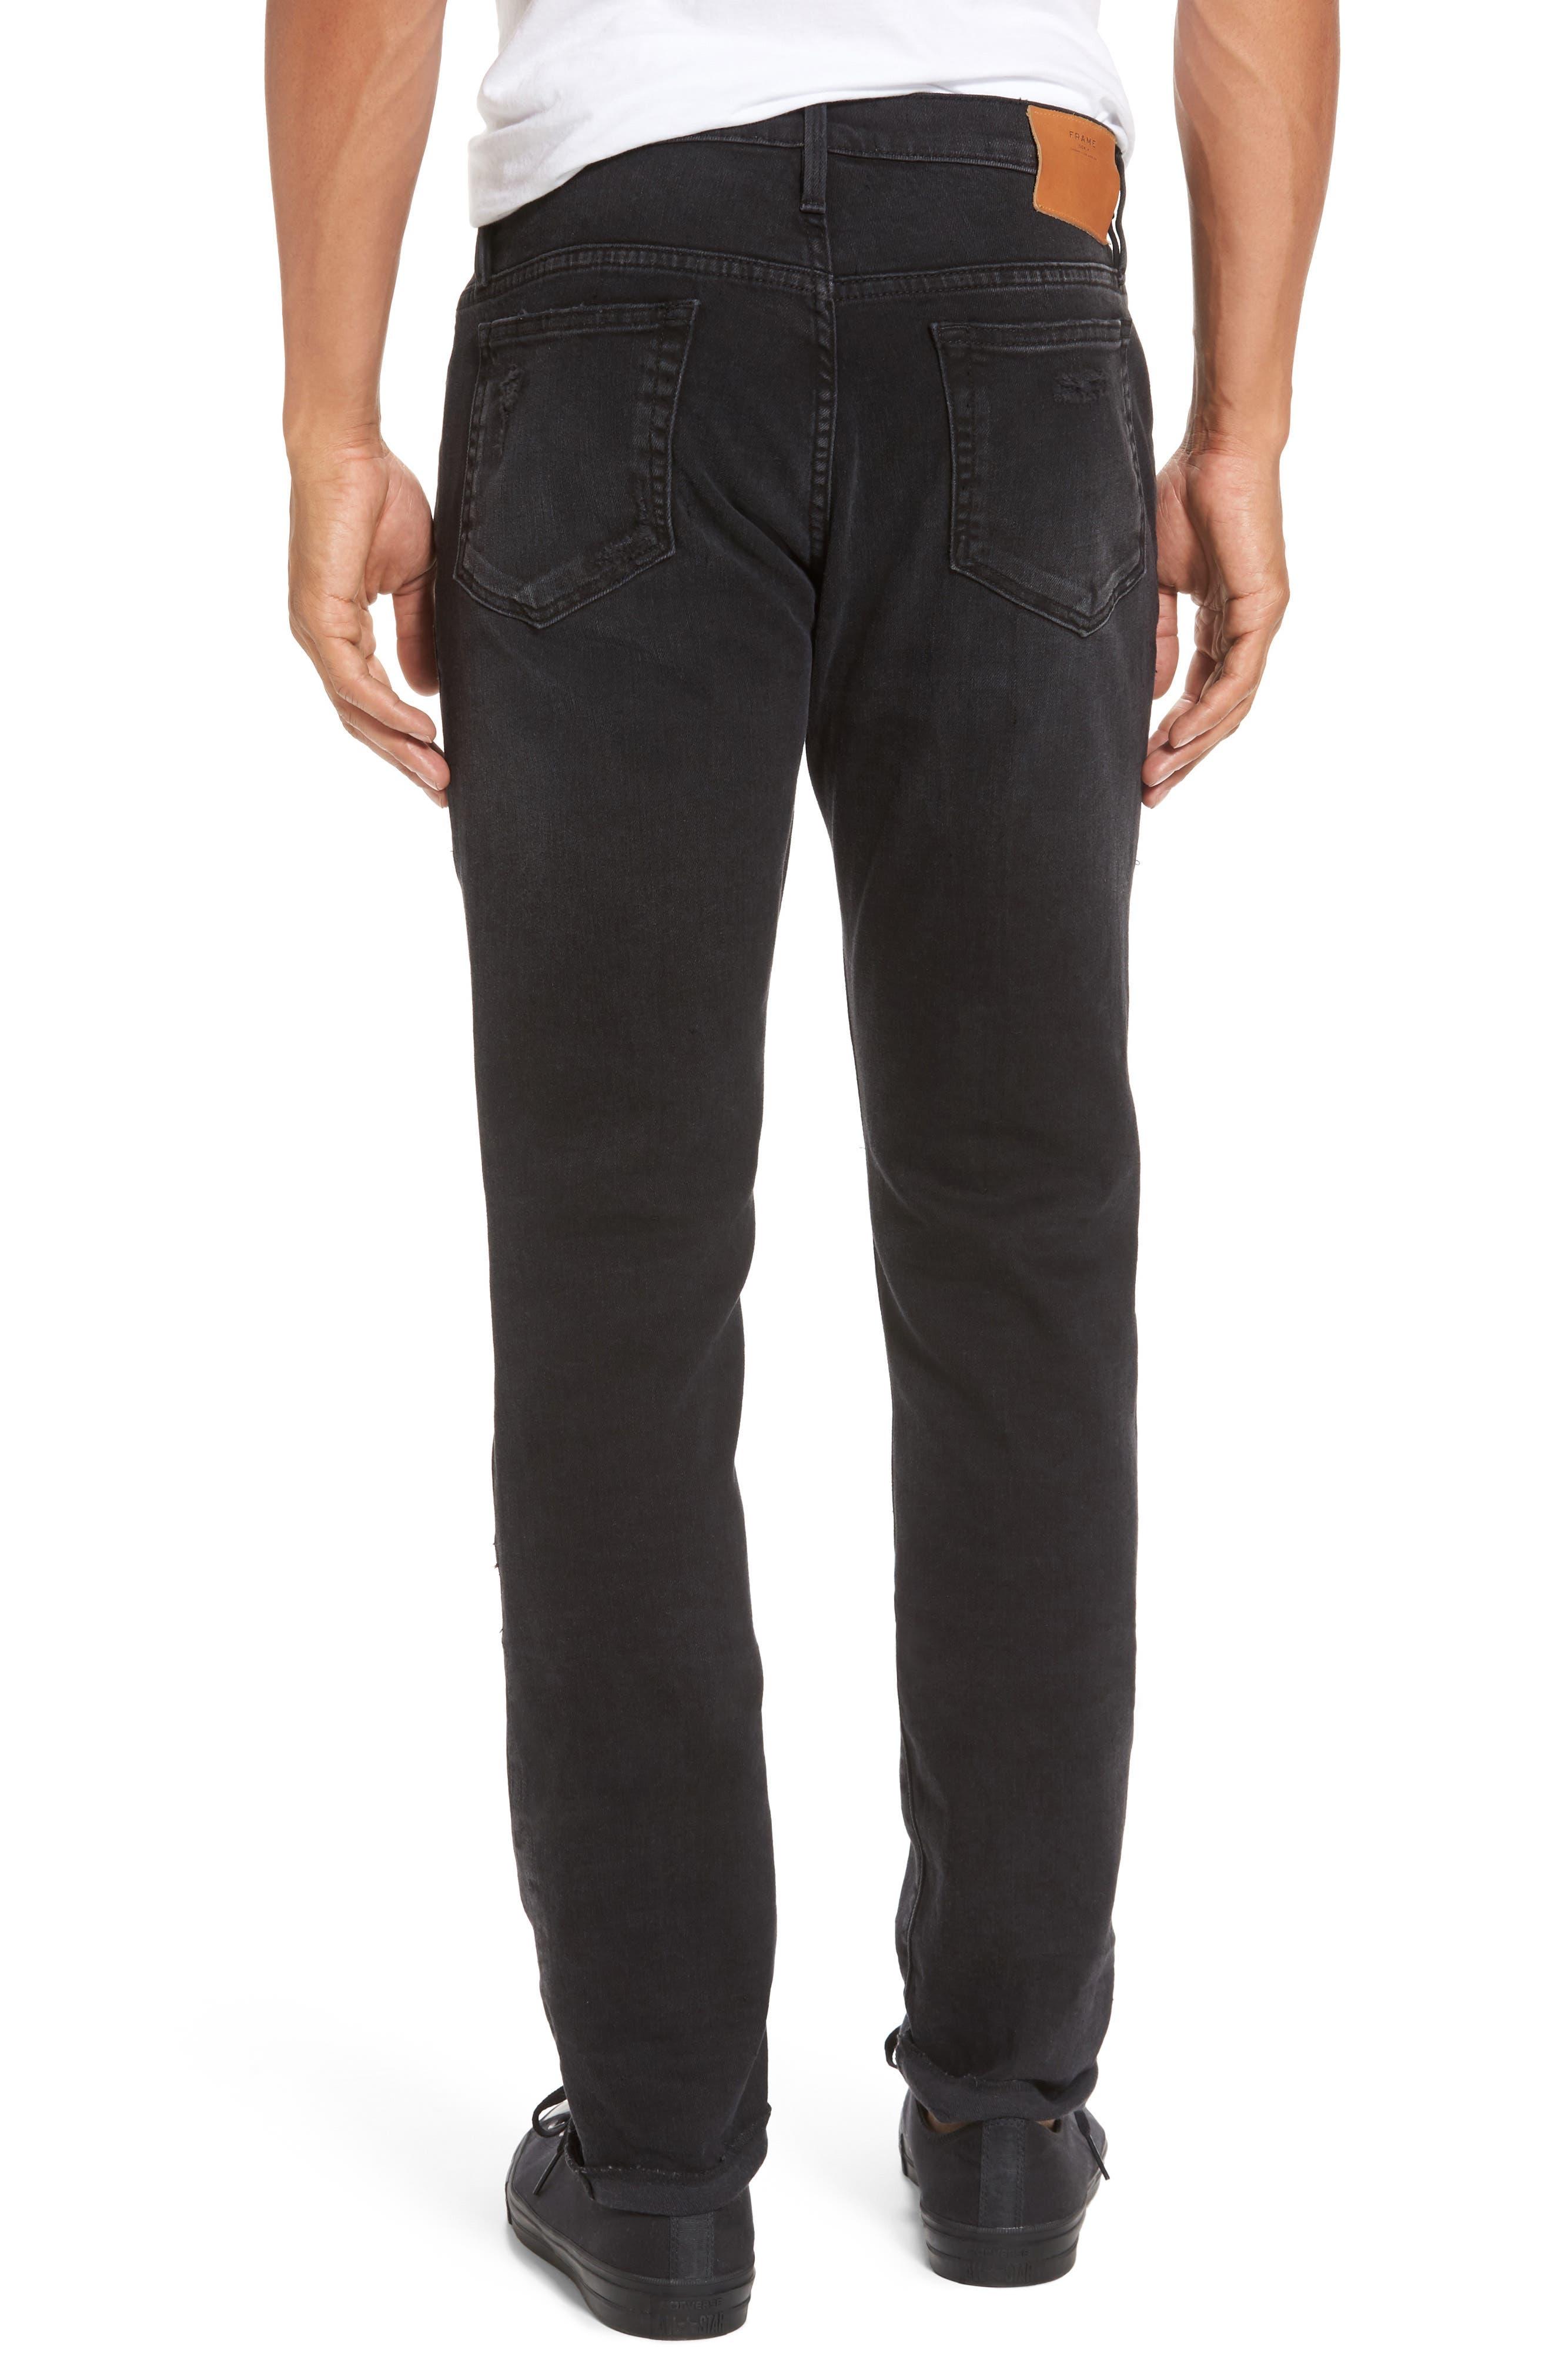 L'Homme Skinny Fit Jeans,                             Alternate thumbnail 2, color,                             001